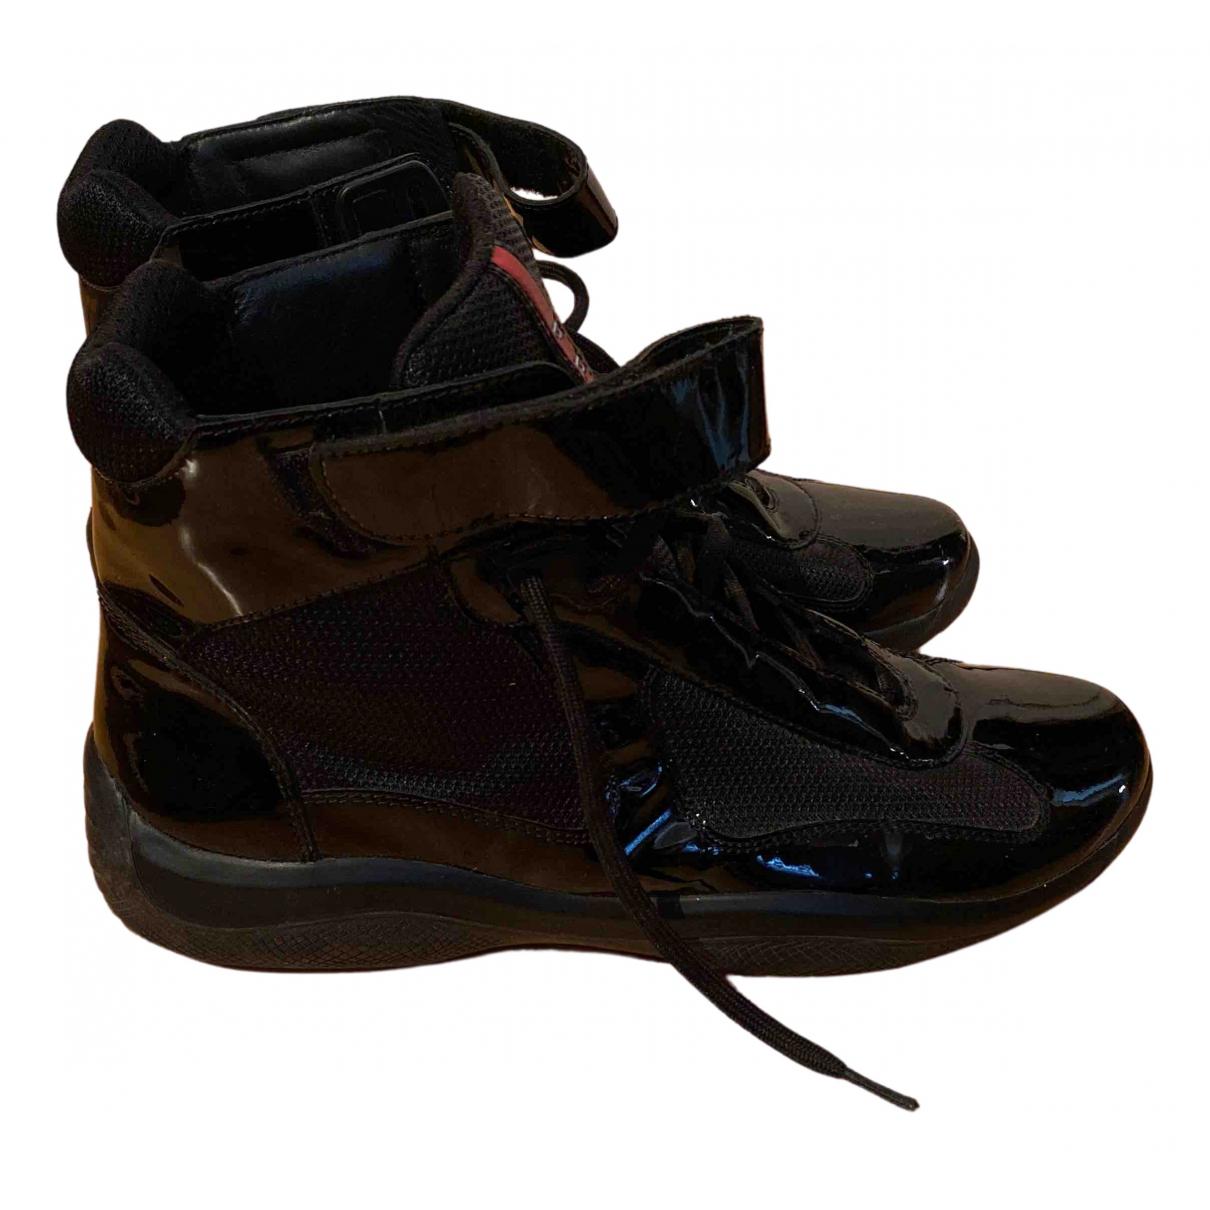 Prada \N Black Patent leather Trainers for Men 43 EU